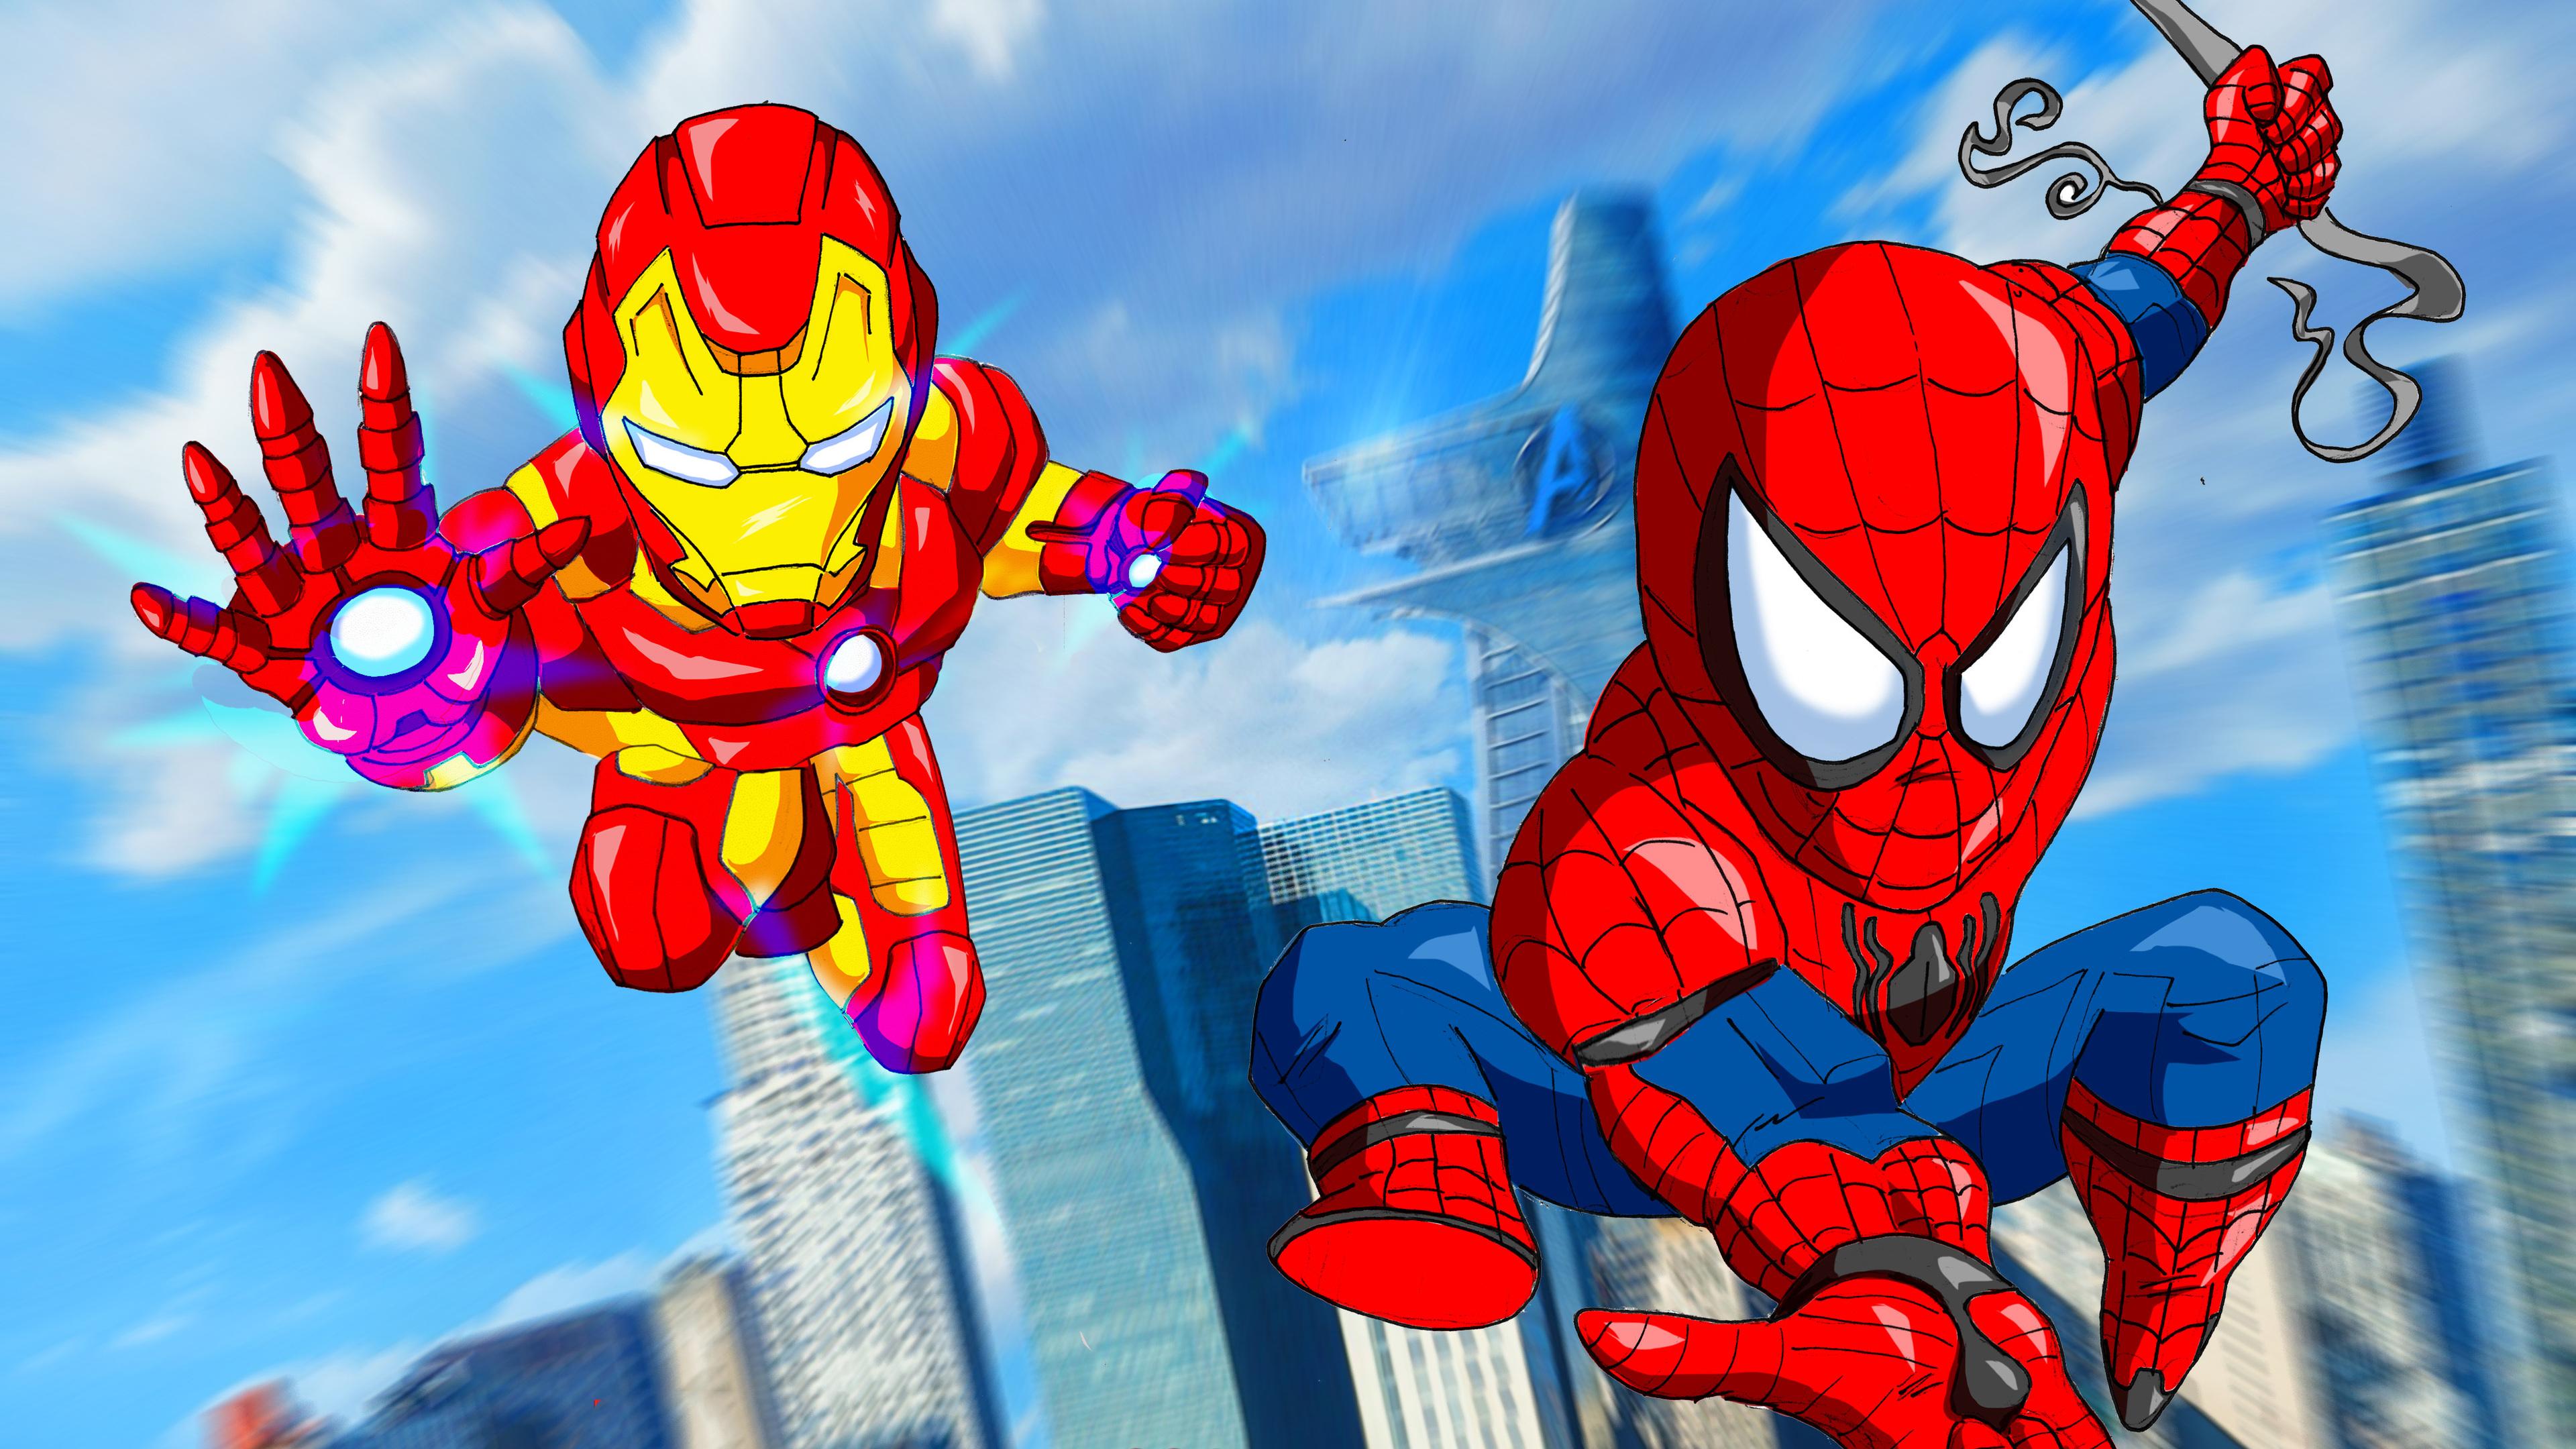 Wallpaper 4k Spiderman Homecoming Movie Art 4k Wallpapers